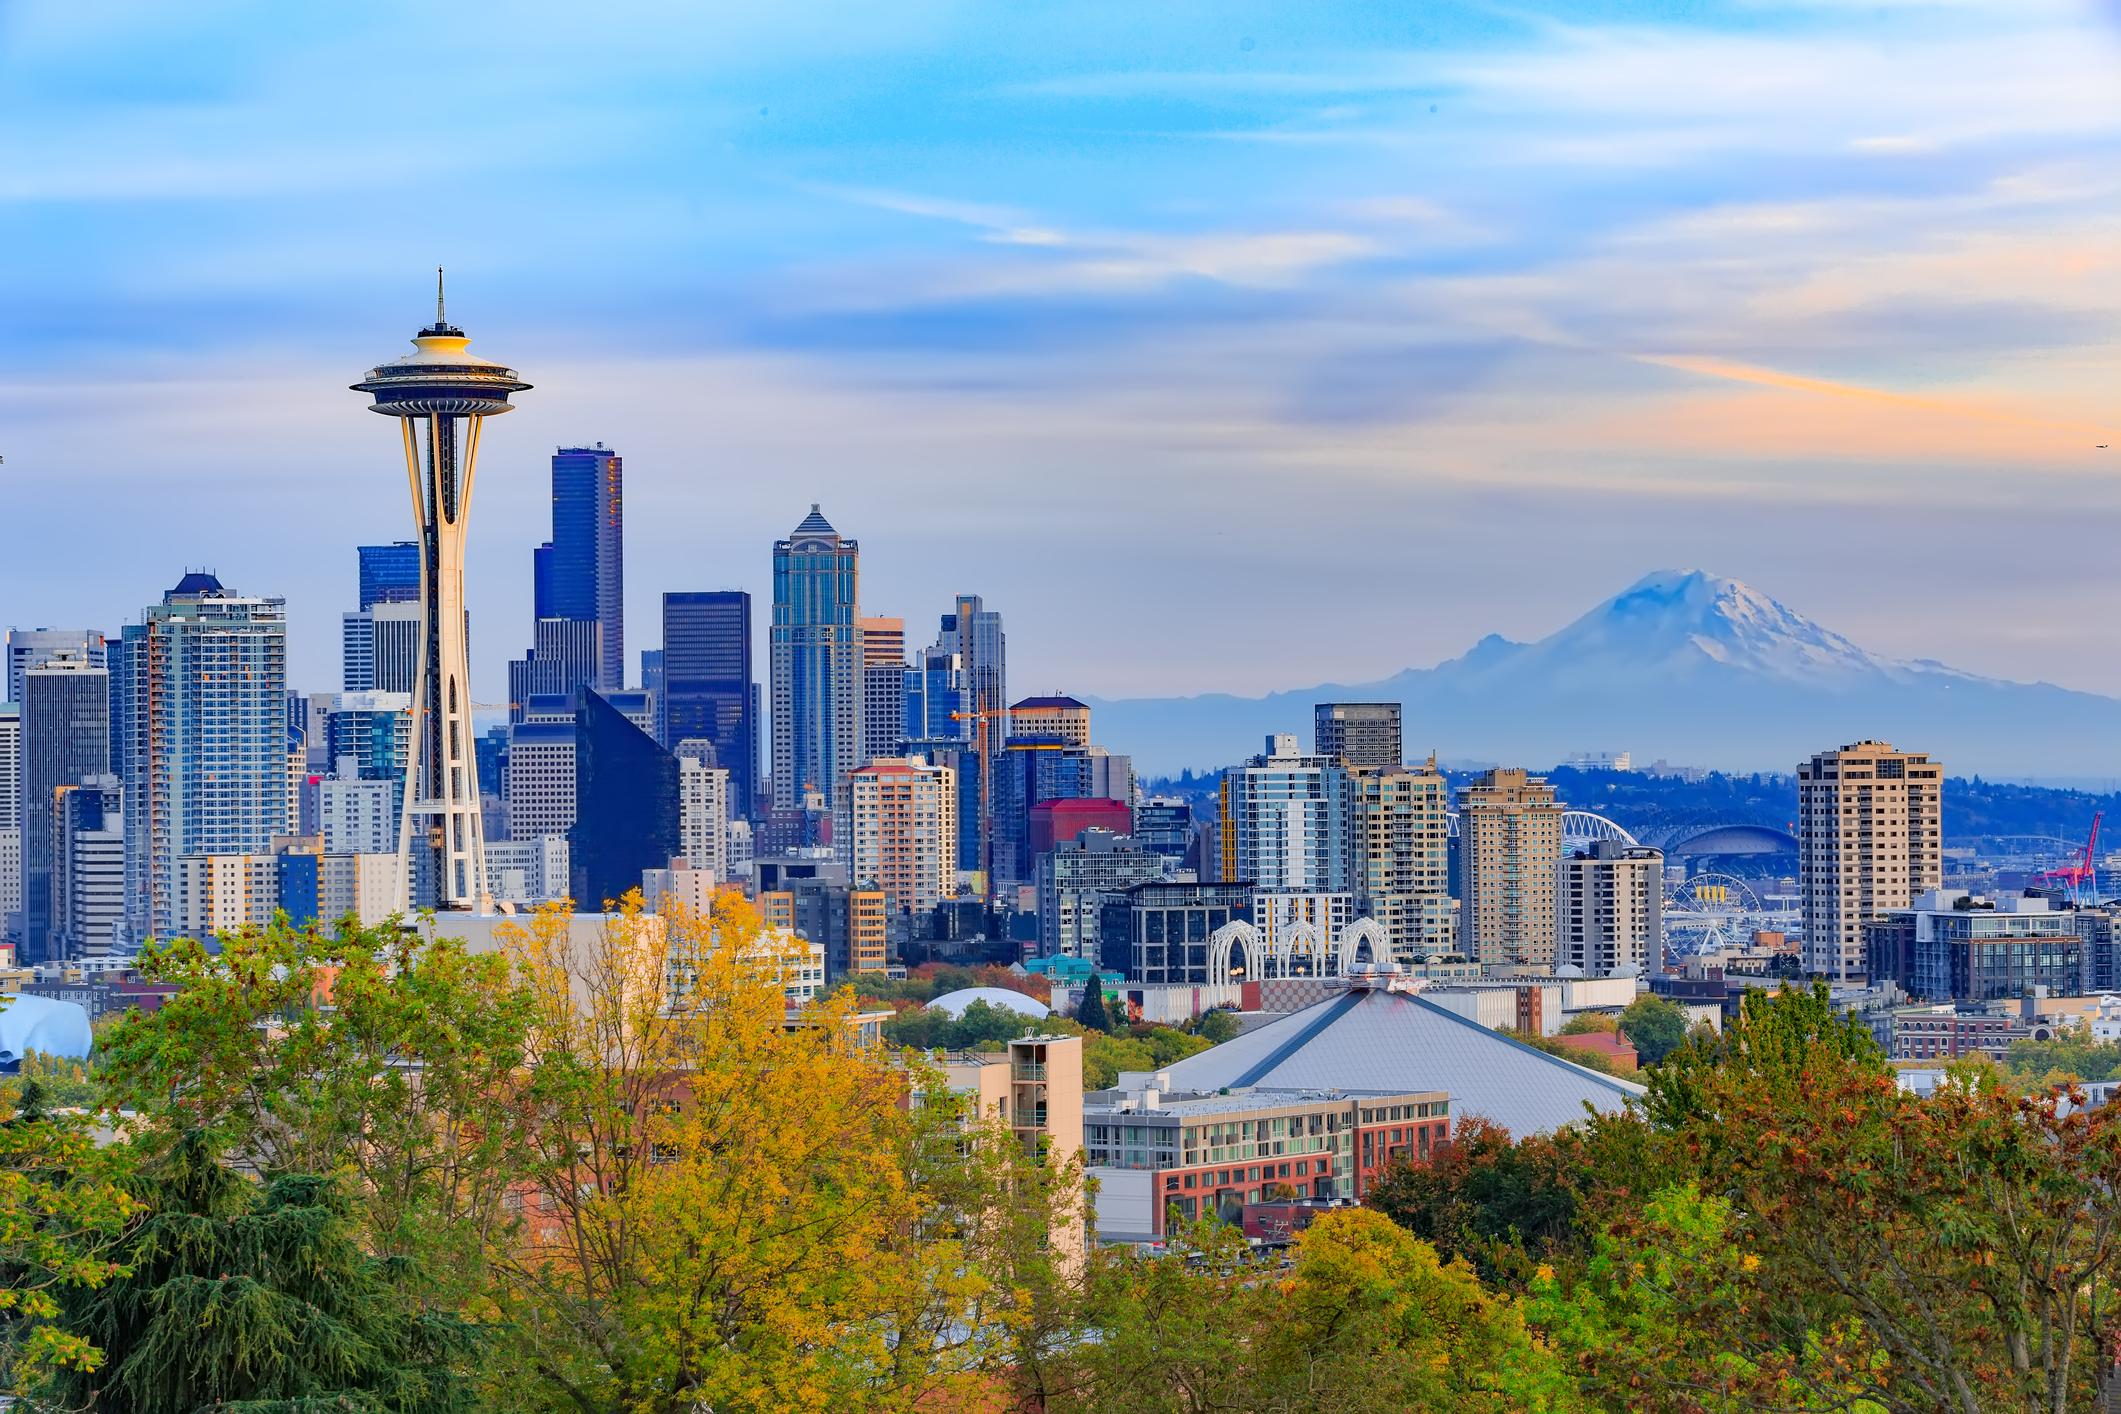 View of Seattle, Washington